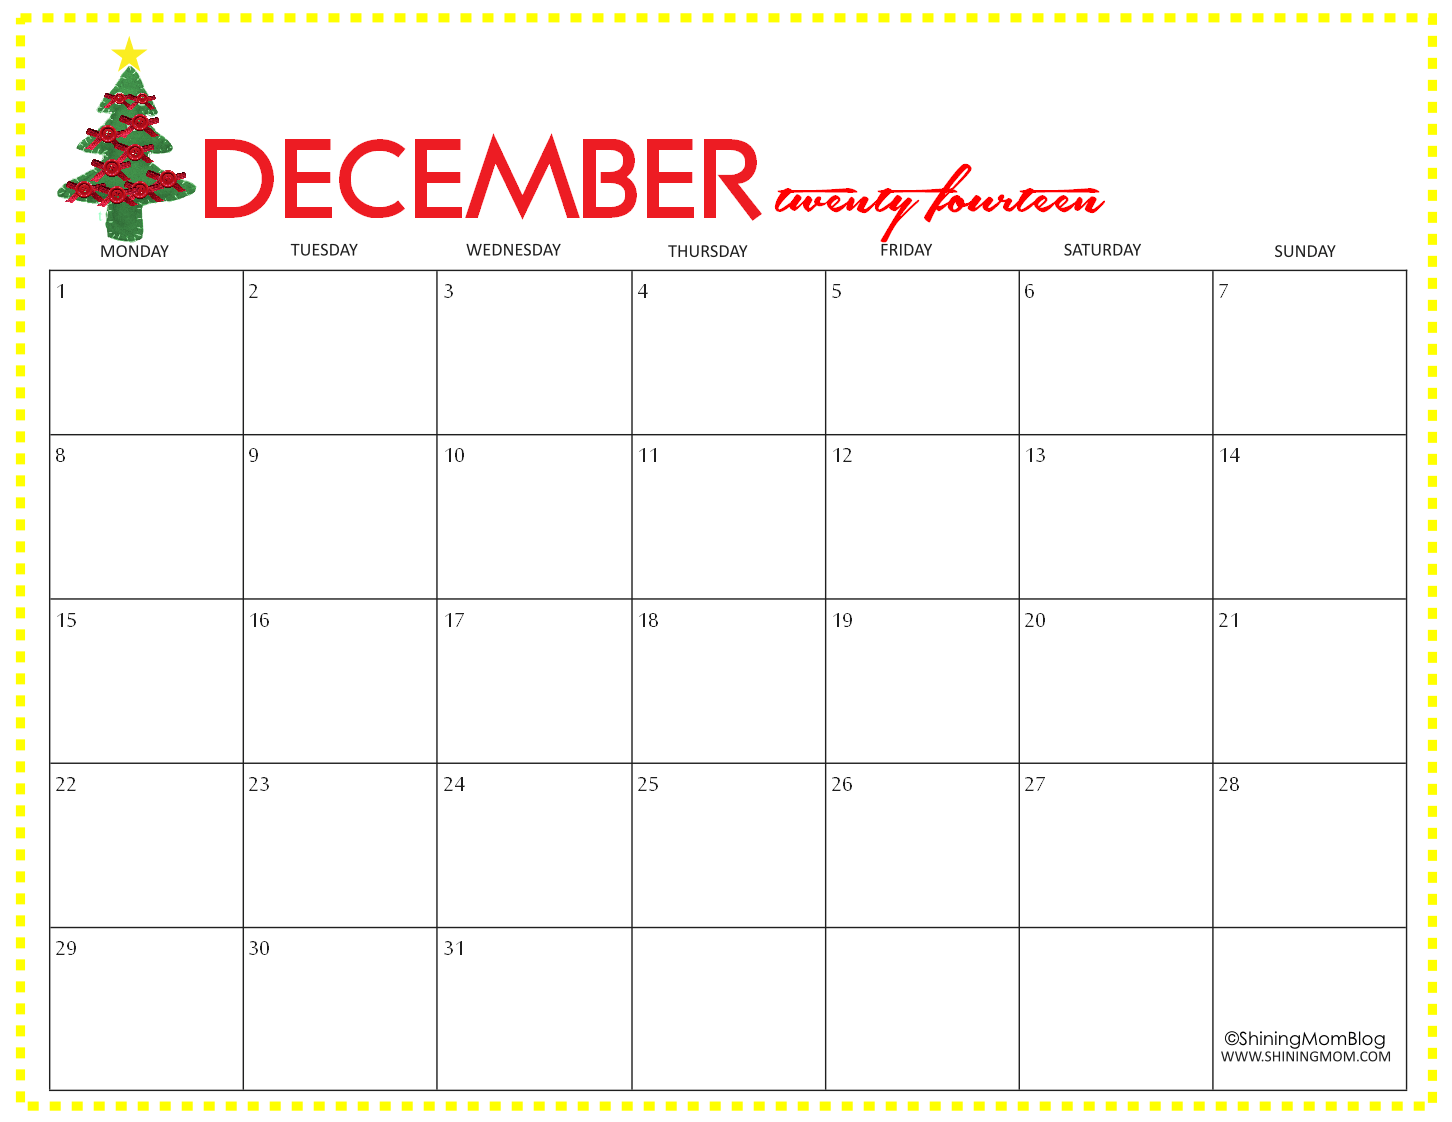 December 2014 Calendar With Holidays